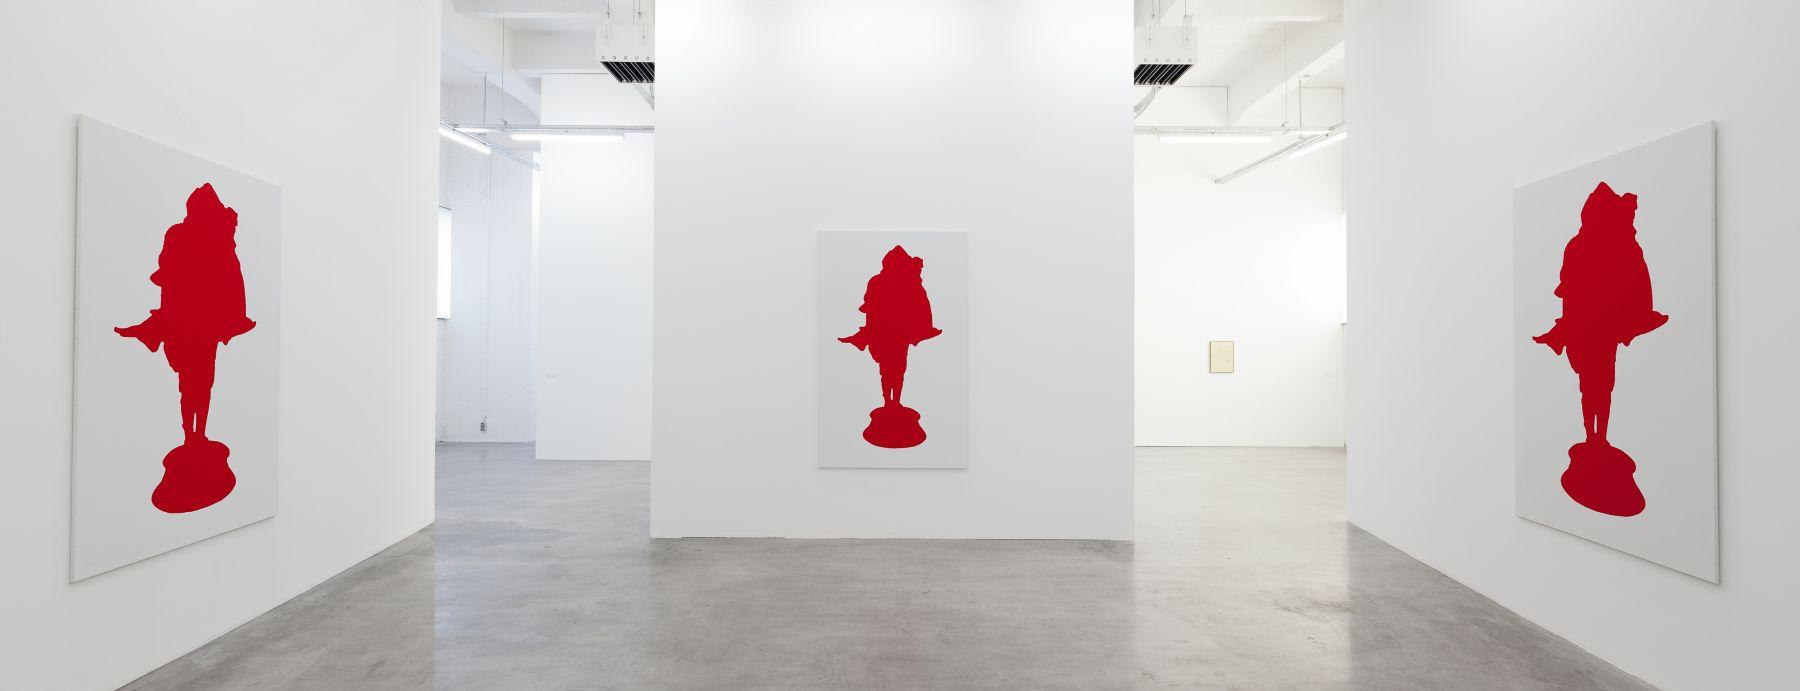 Installation view, Apperception, WIELS, Contemporary Art Center, Brussels, 2012